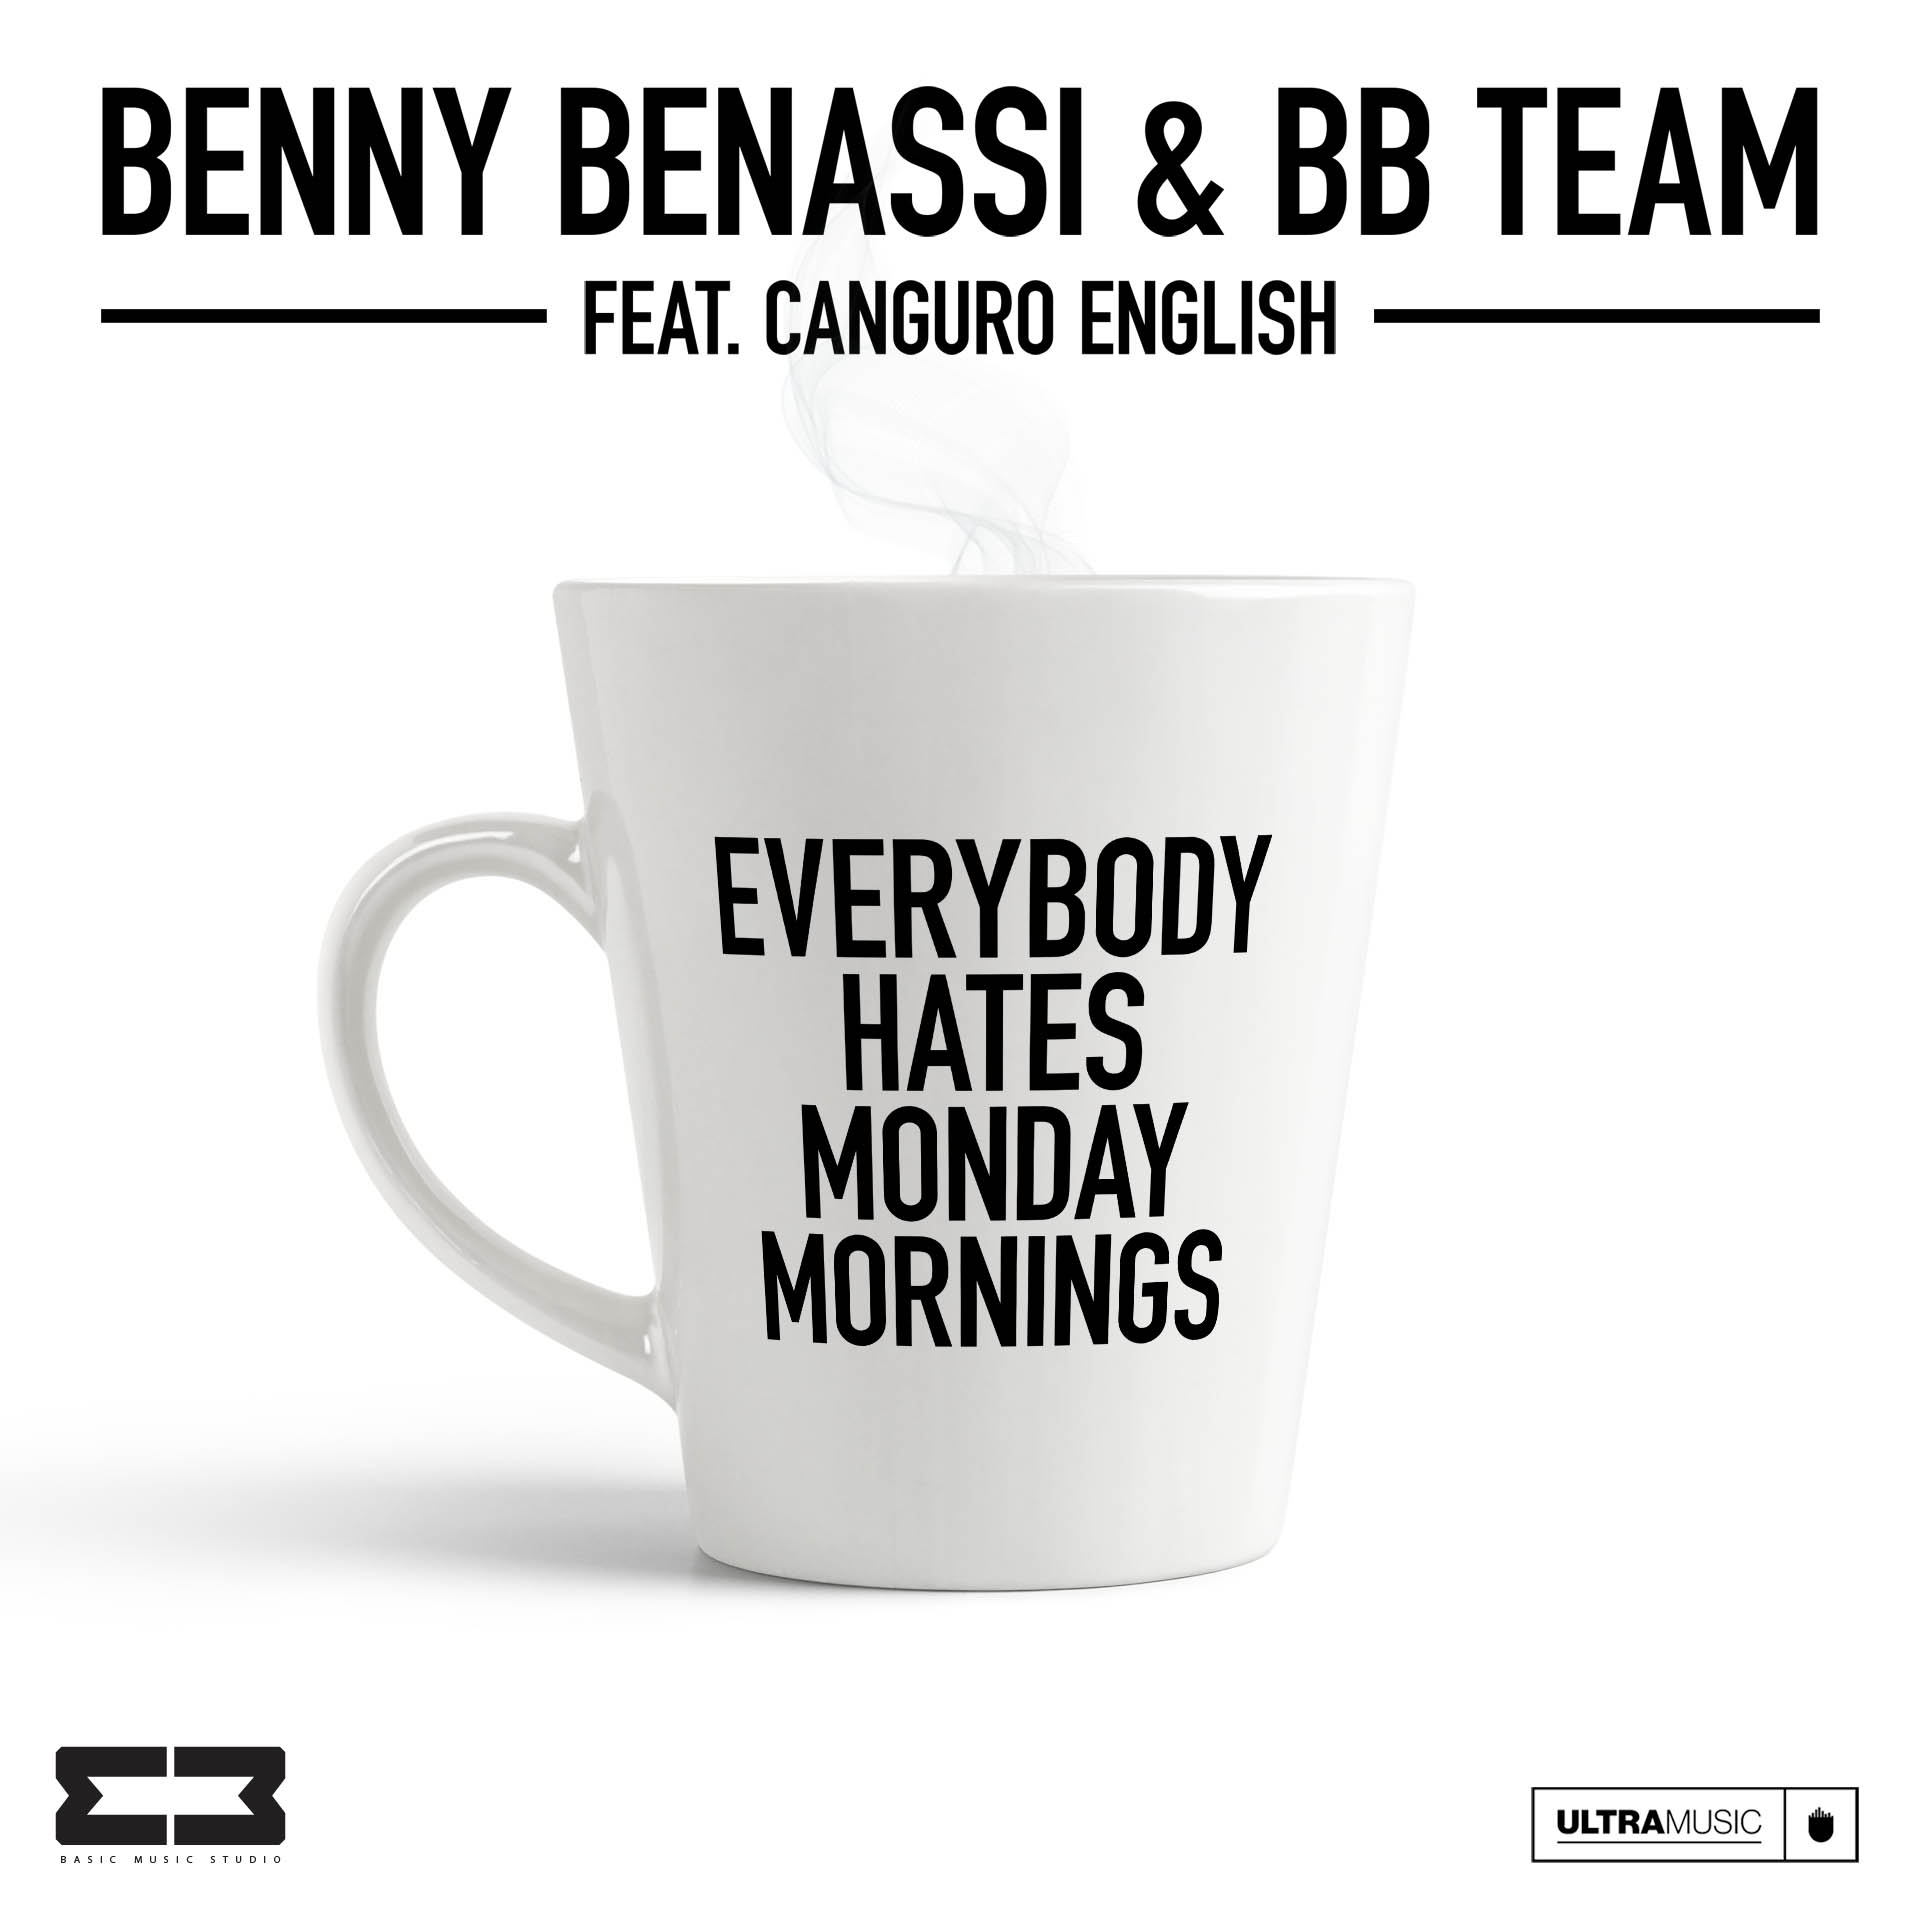 Benny Benassi & BB Team feat